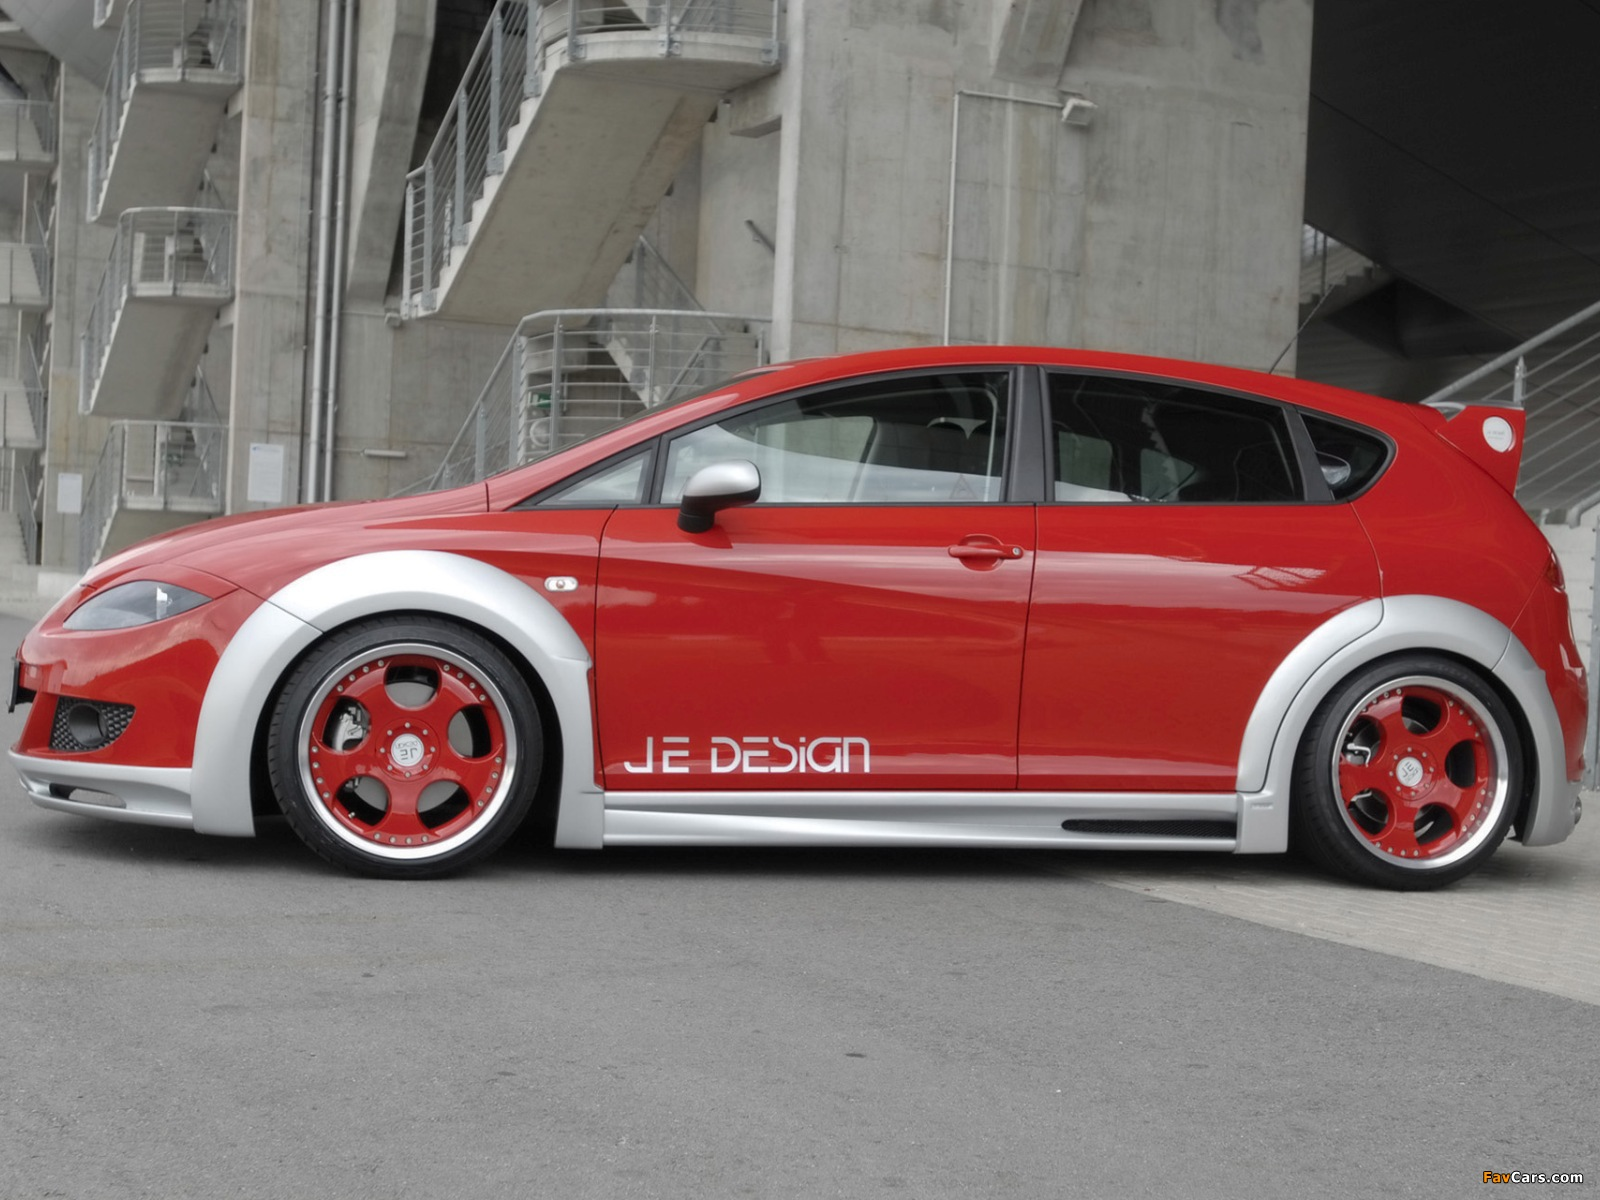 Je Design Seat Leon 2006 photos (1600 x 1200)